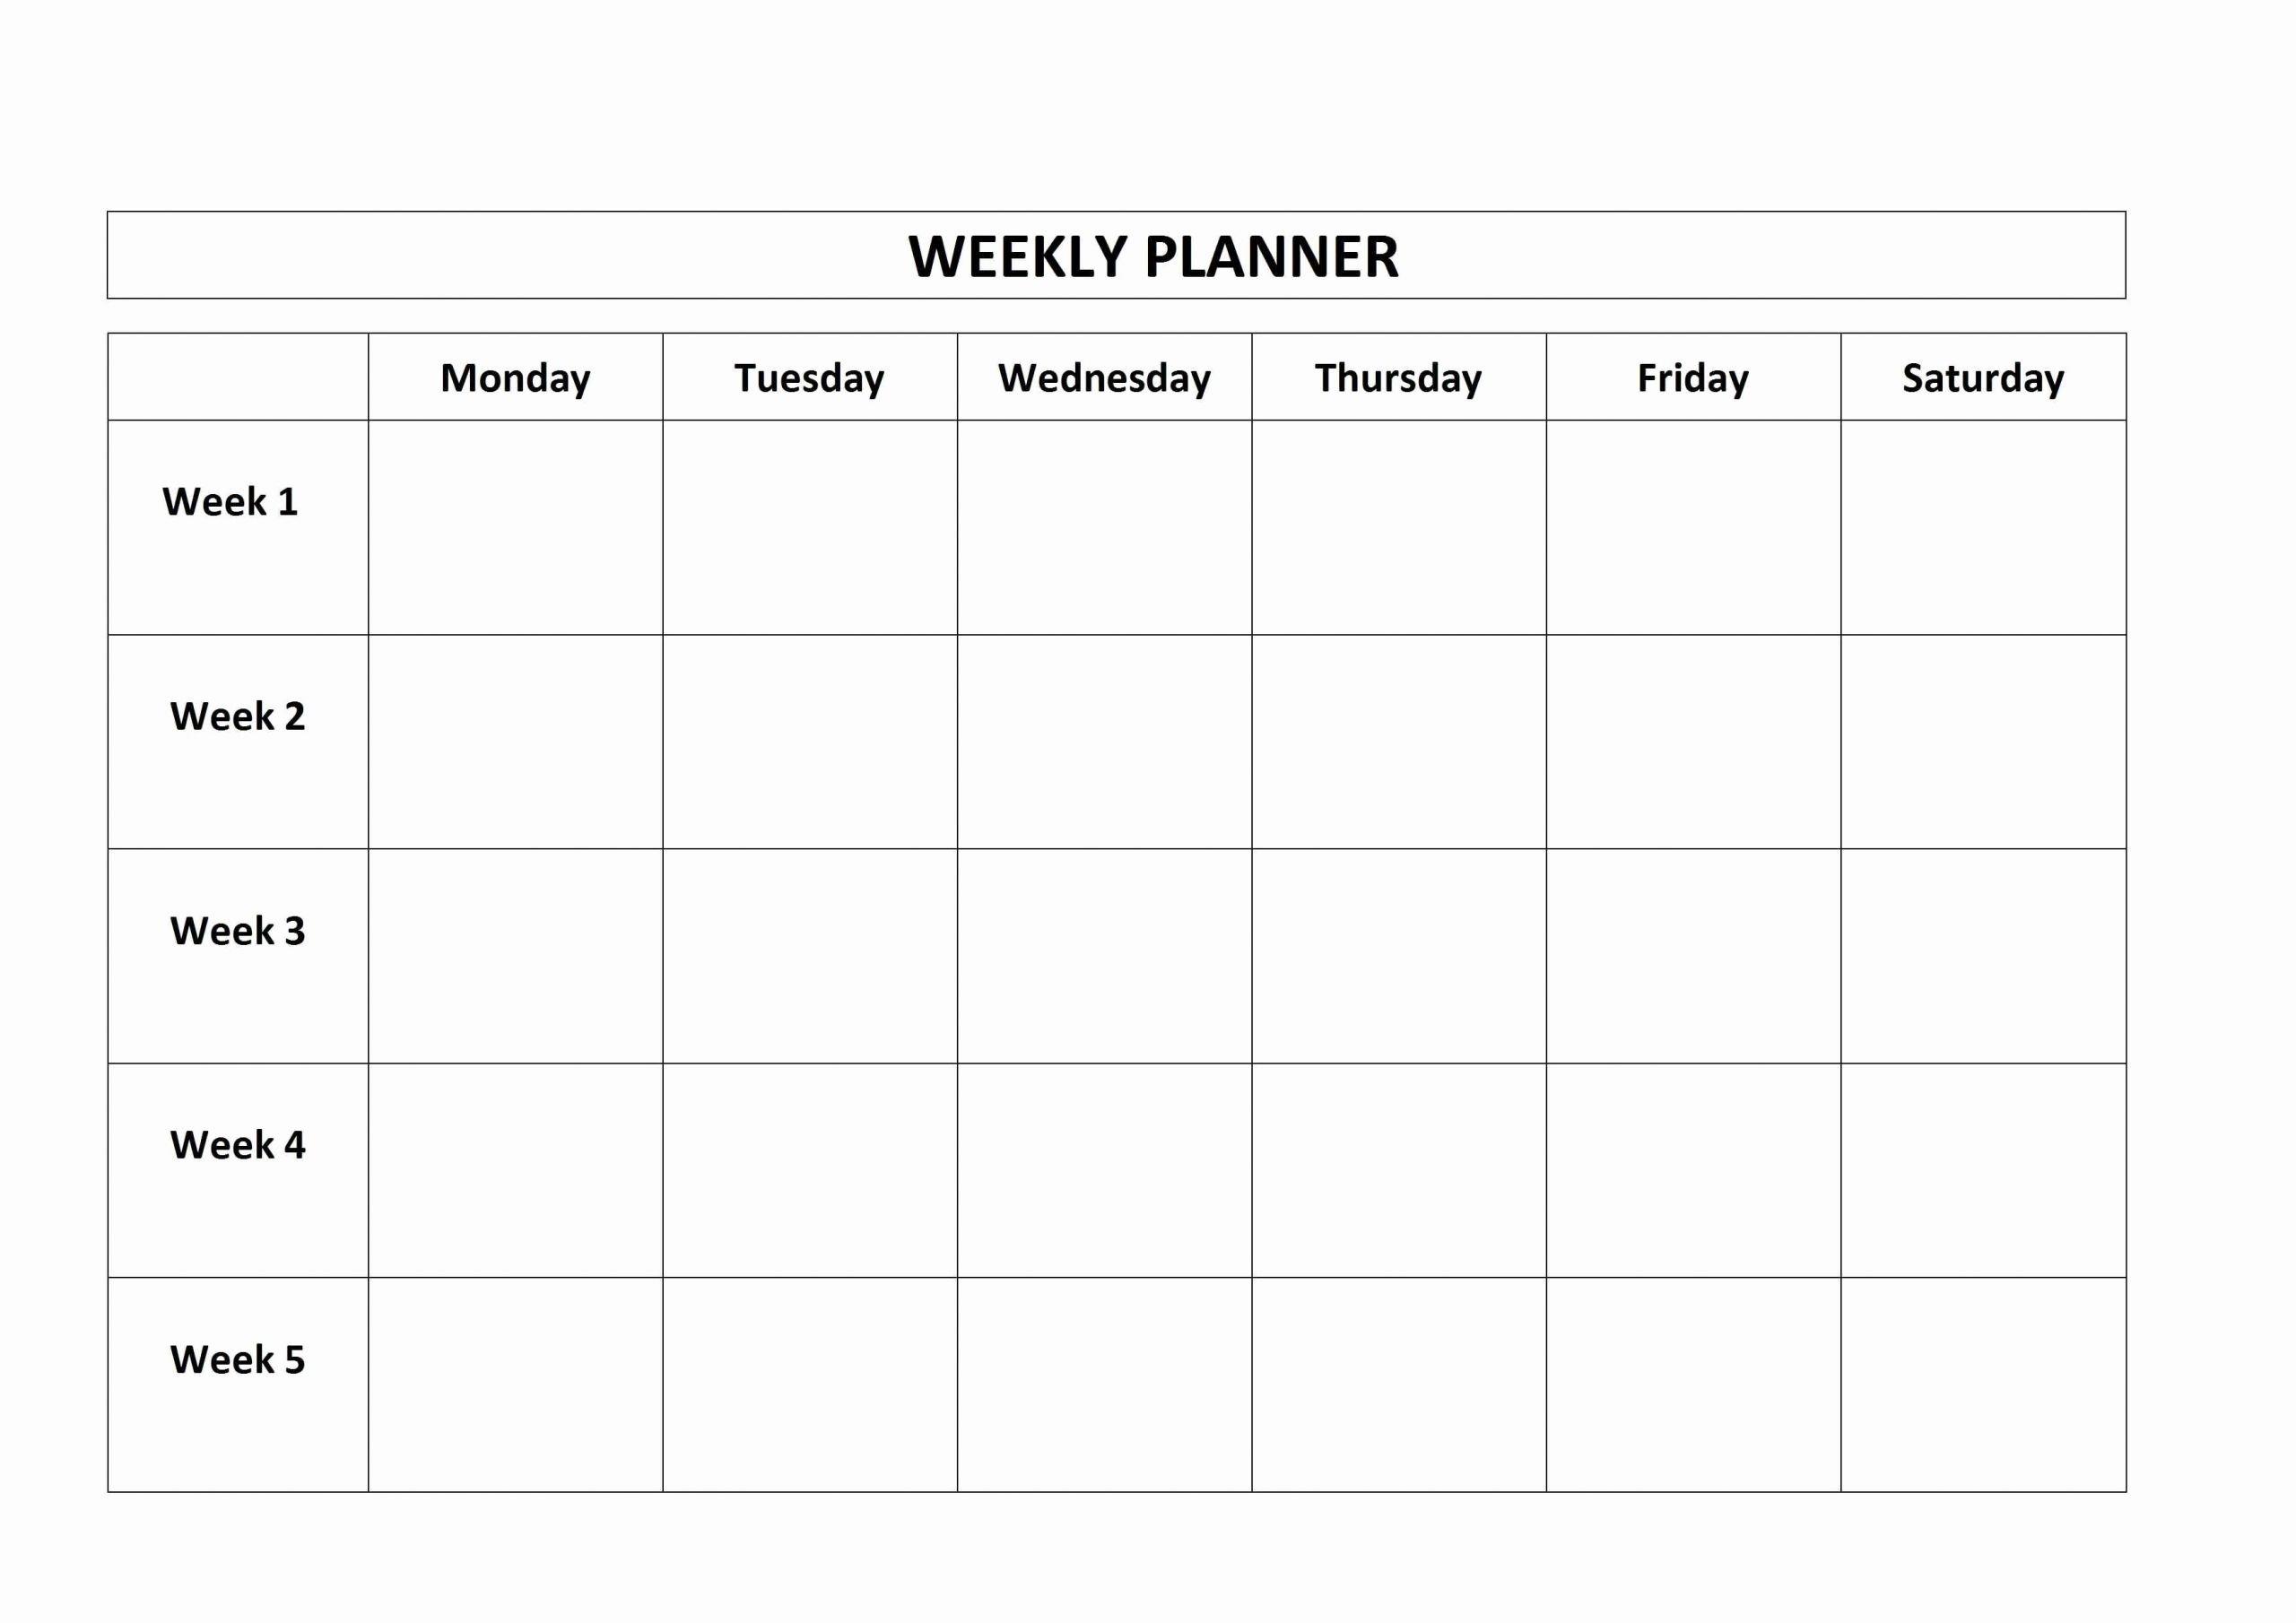 Sunday School Schedule Template Best Of Free Printable Weekly Planner Monday Friday School